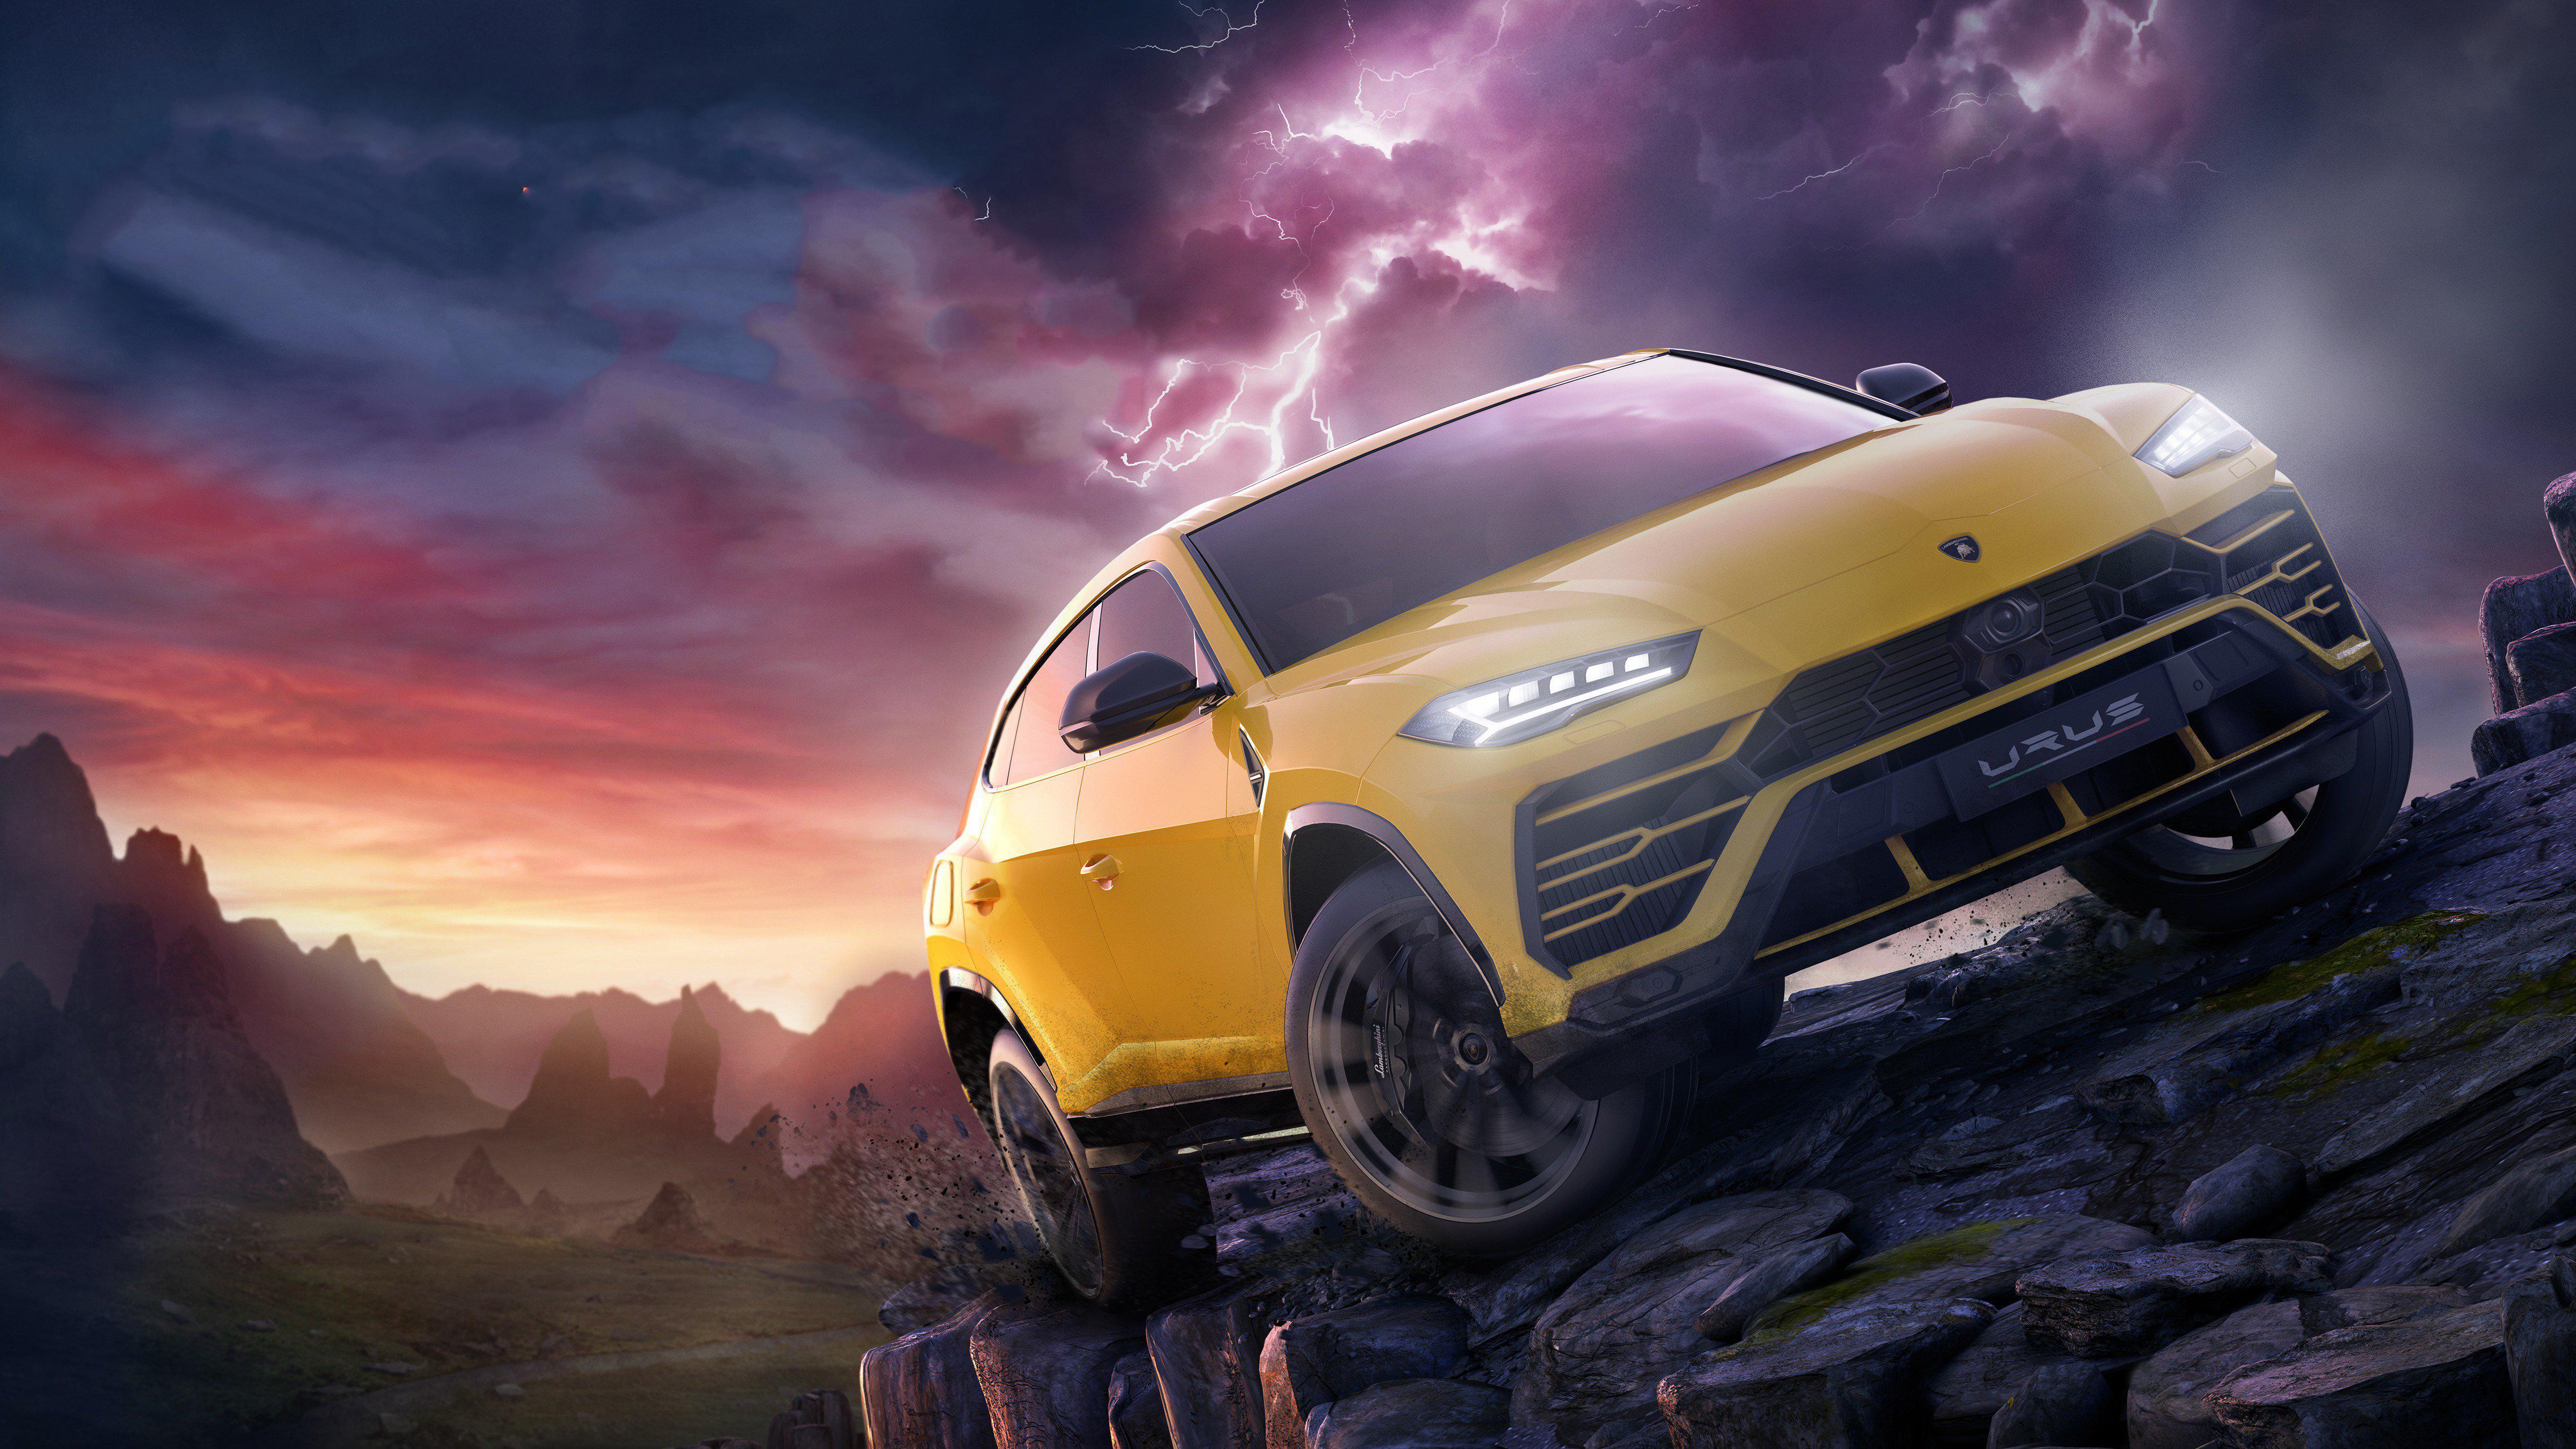 Lamborghini Urus Forza Horizon 4 Fortune Island Hd Games 4k